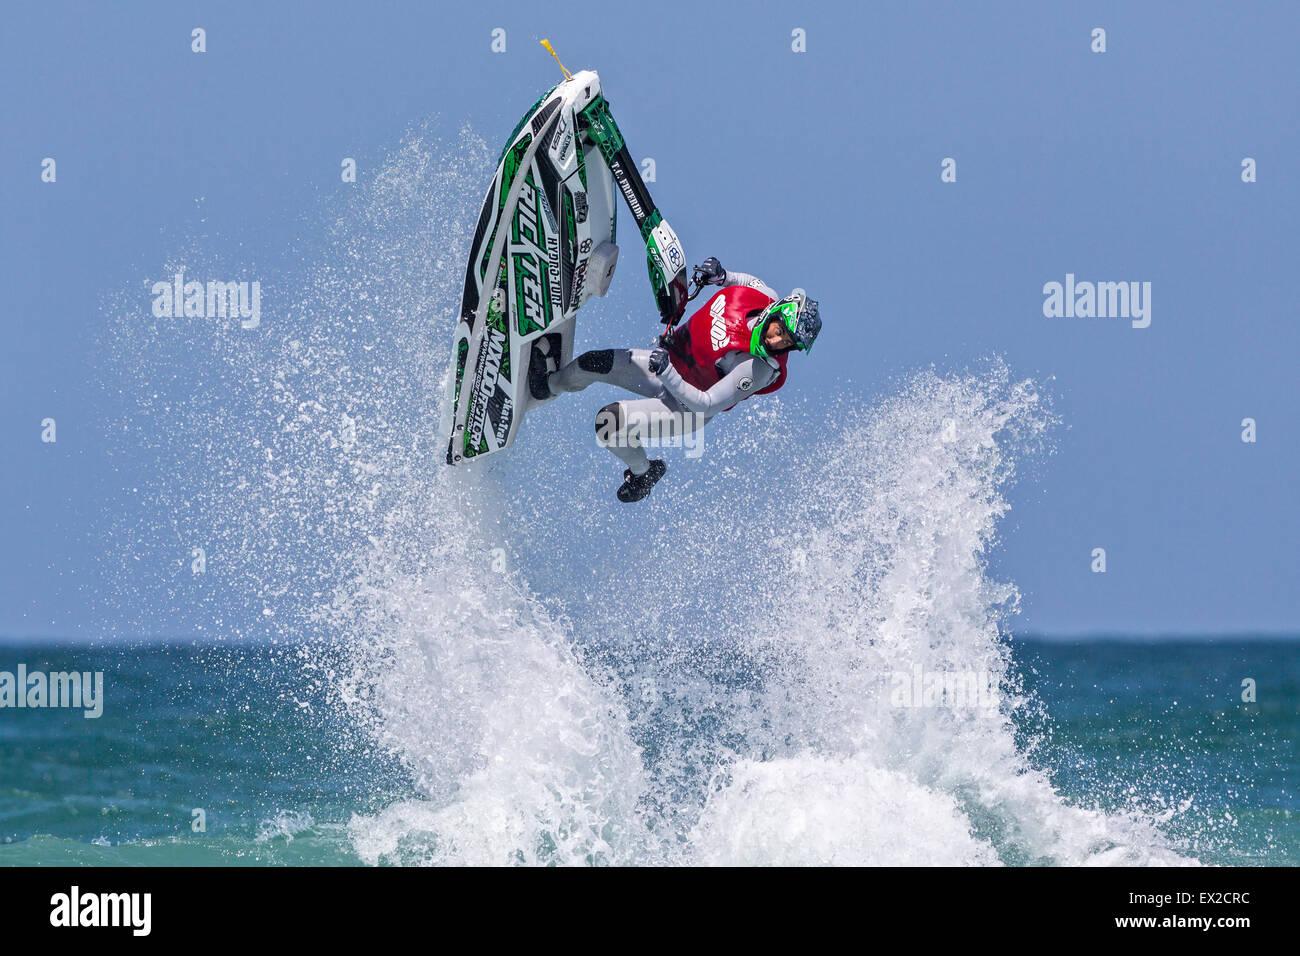 Rider compitiendo en IFWA World Tour 2015, Campeonato de Jet Ski la playa Fistral, Cornualles, en el REINO UNIDO Foto de stock